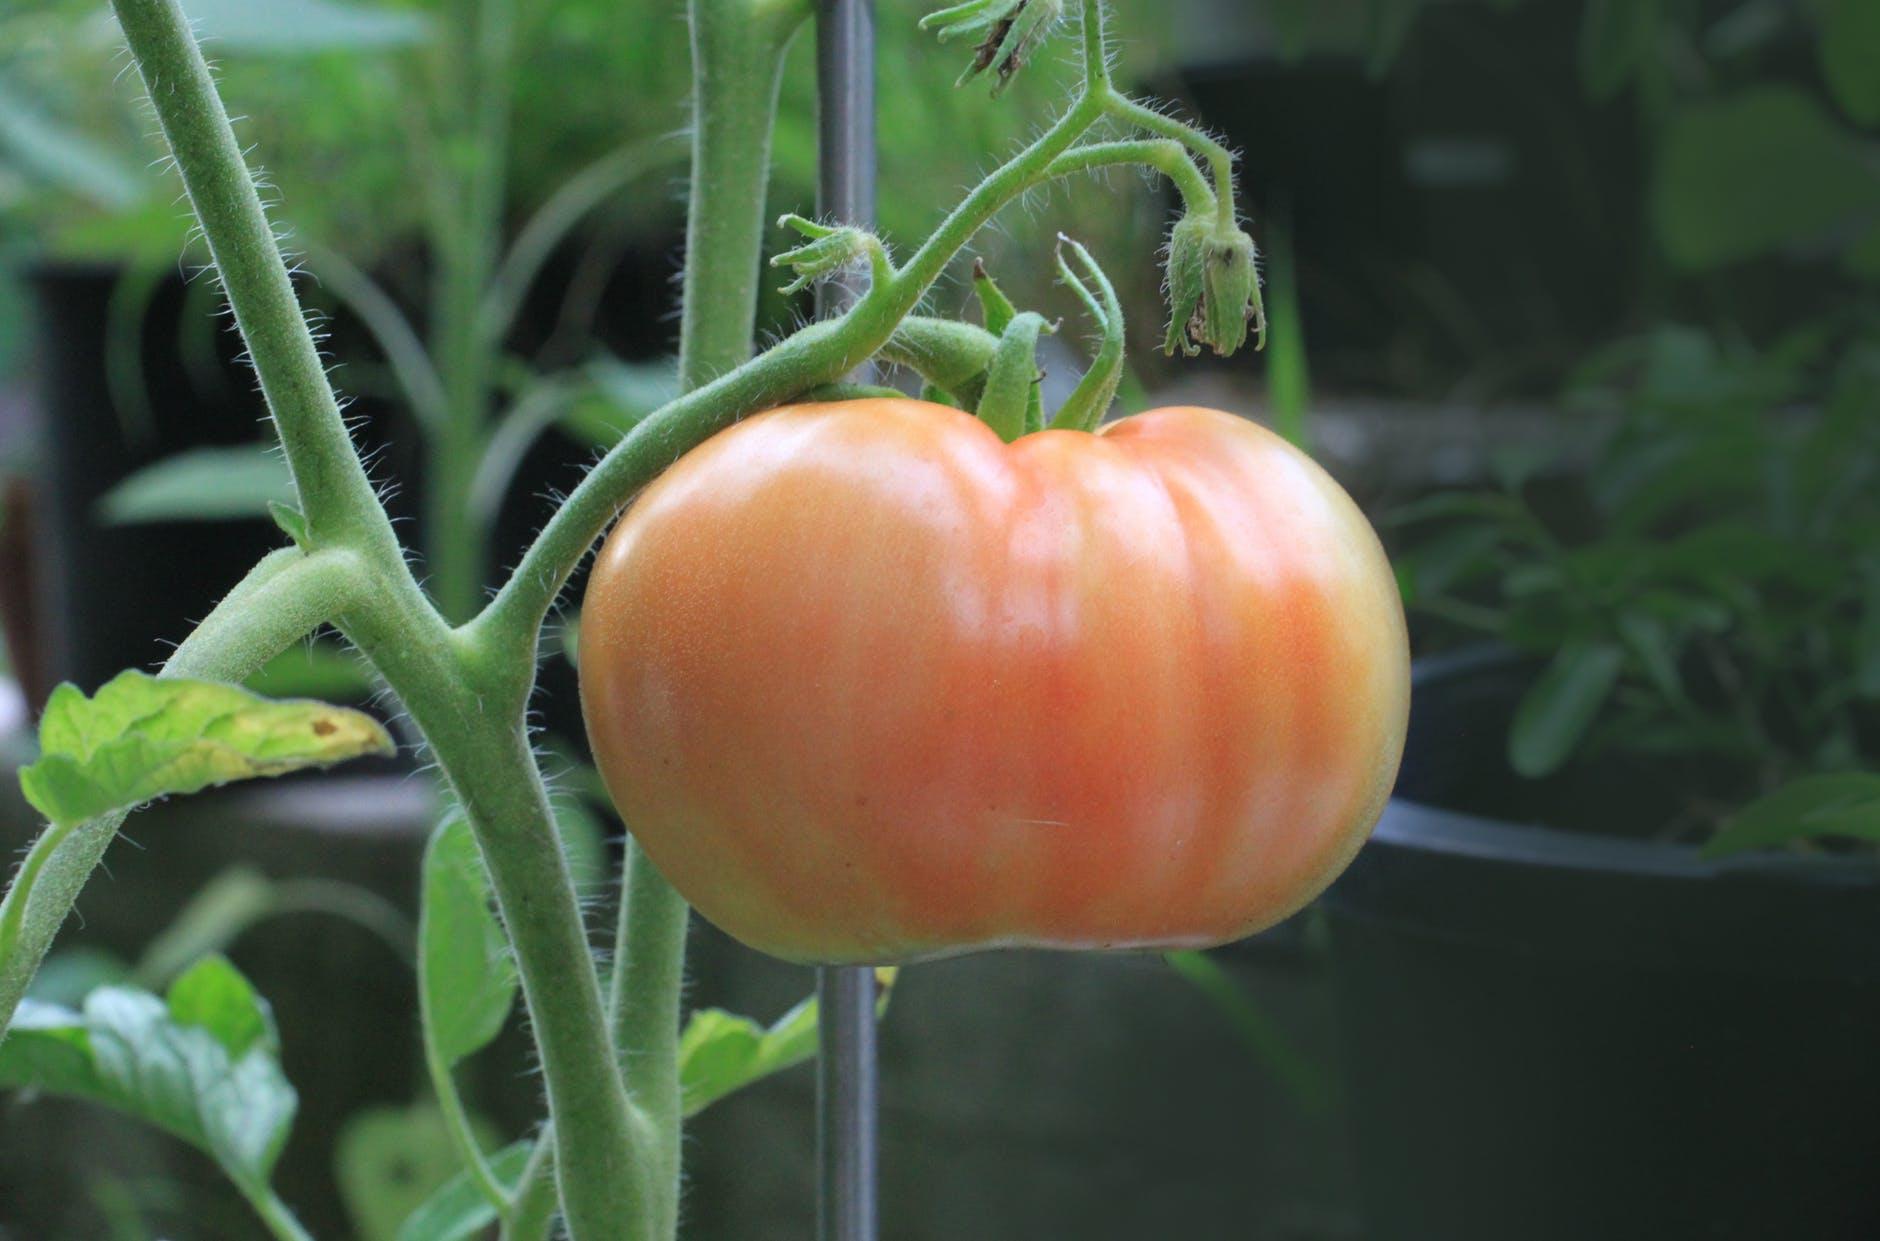 tomato-food-nutrition-plant-161554.jpeg